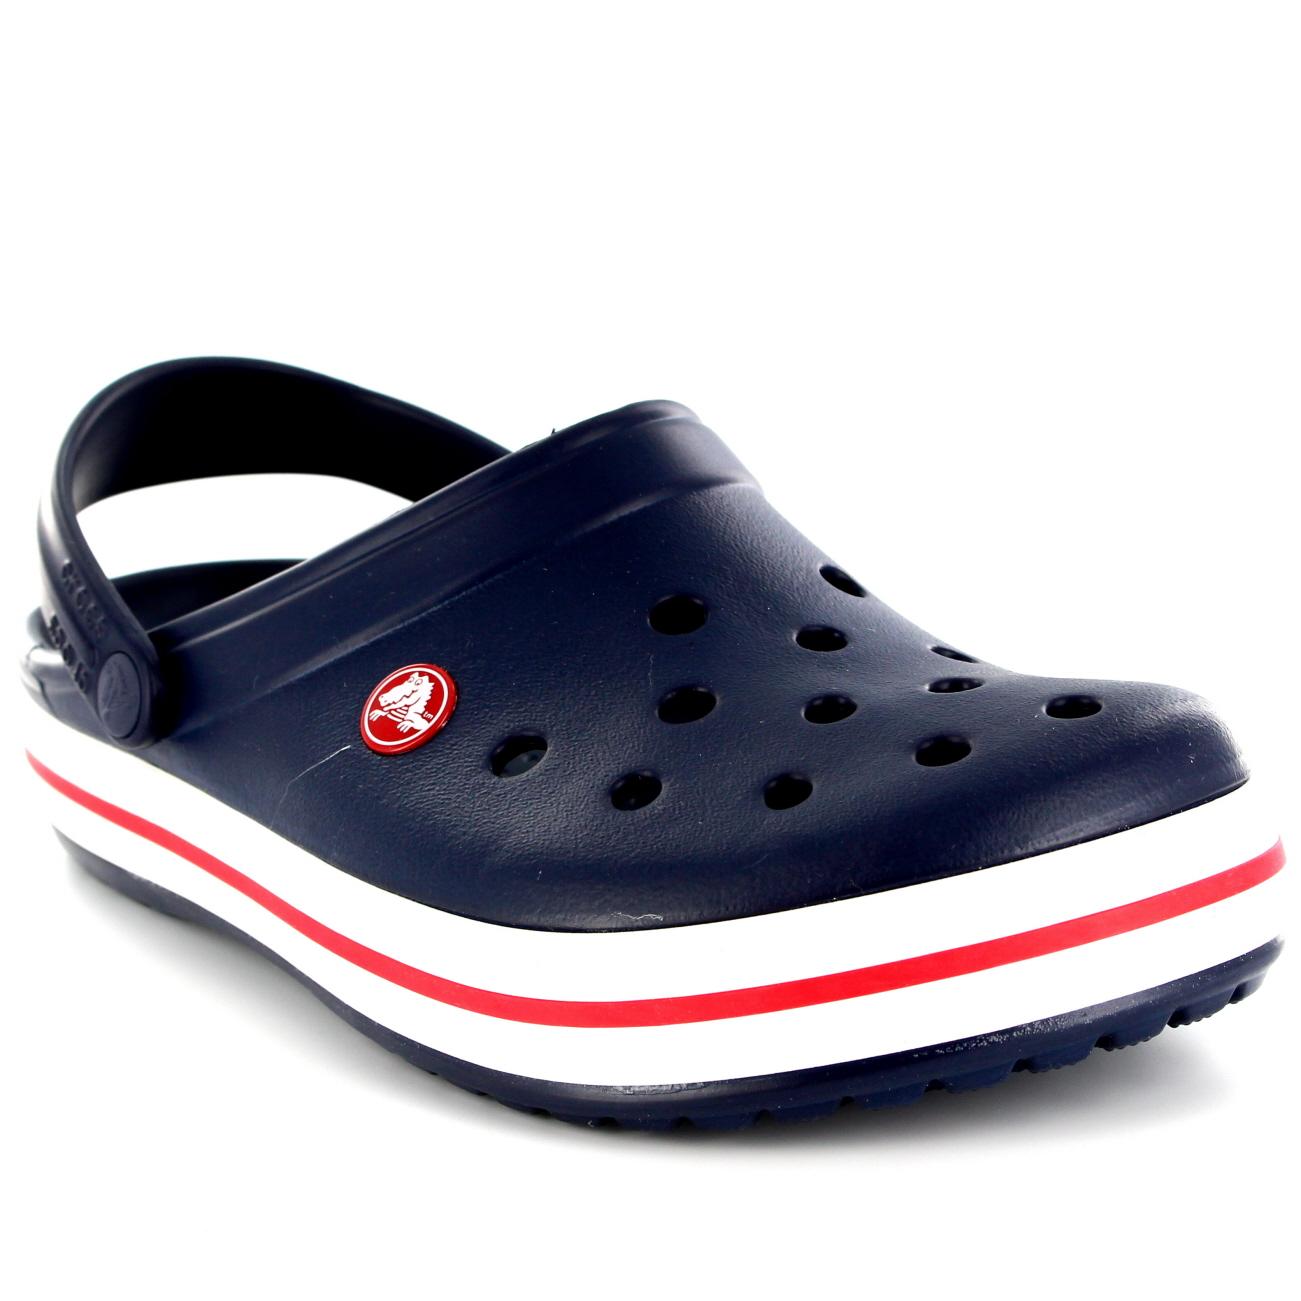 Crocs Crocband Navy Sandals